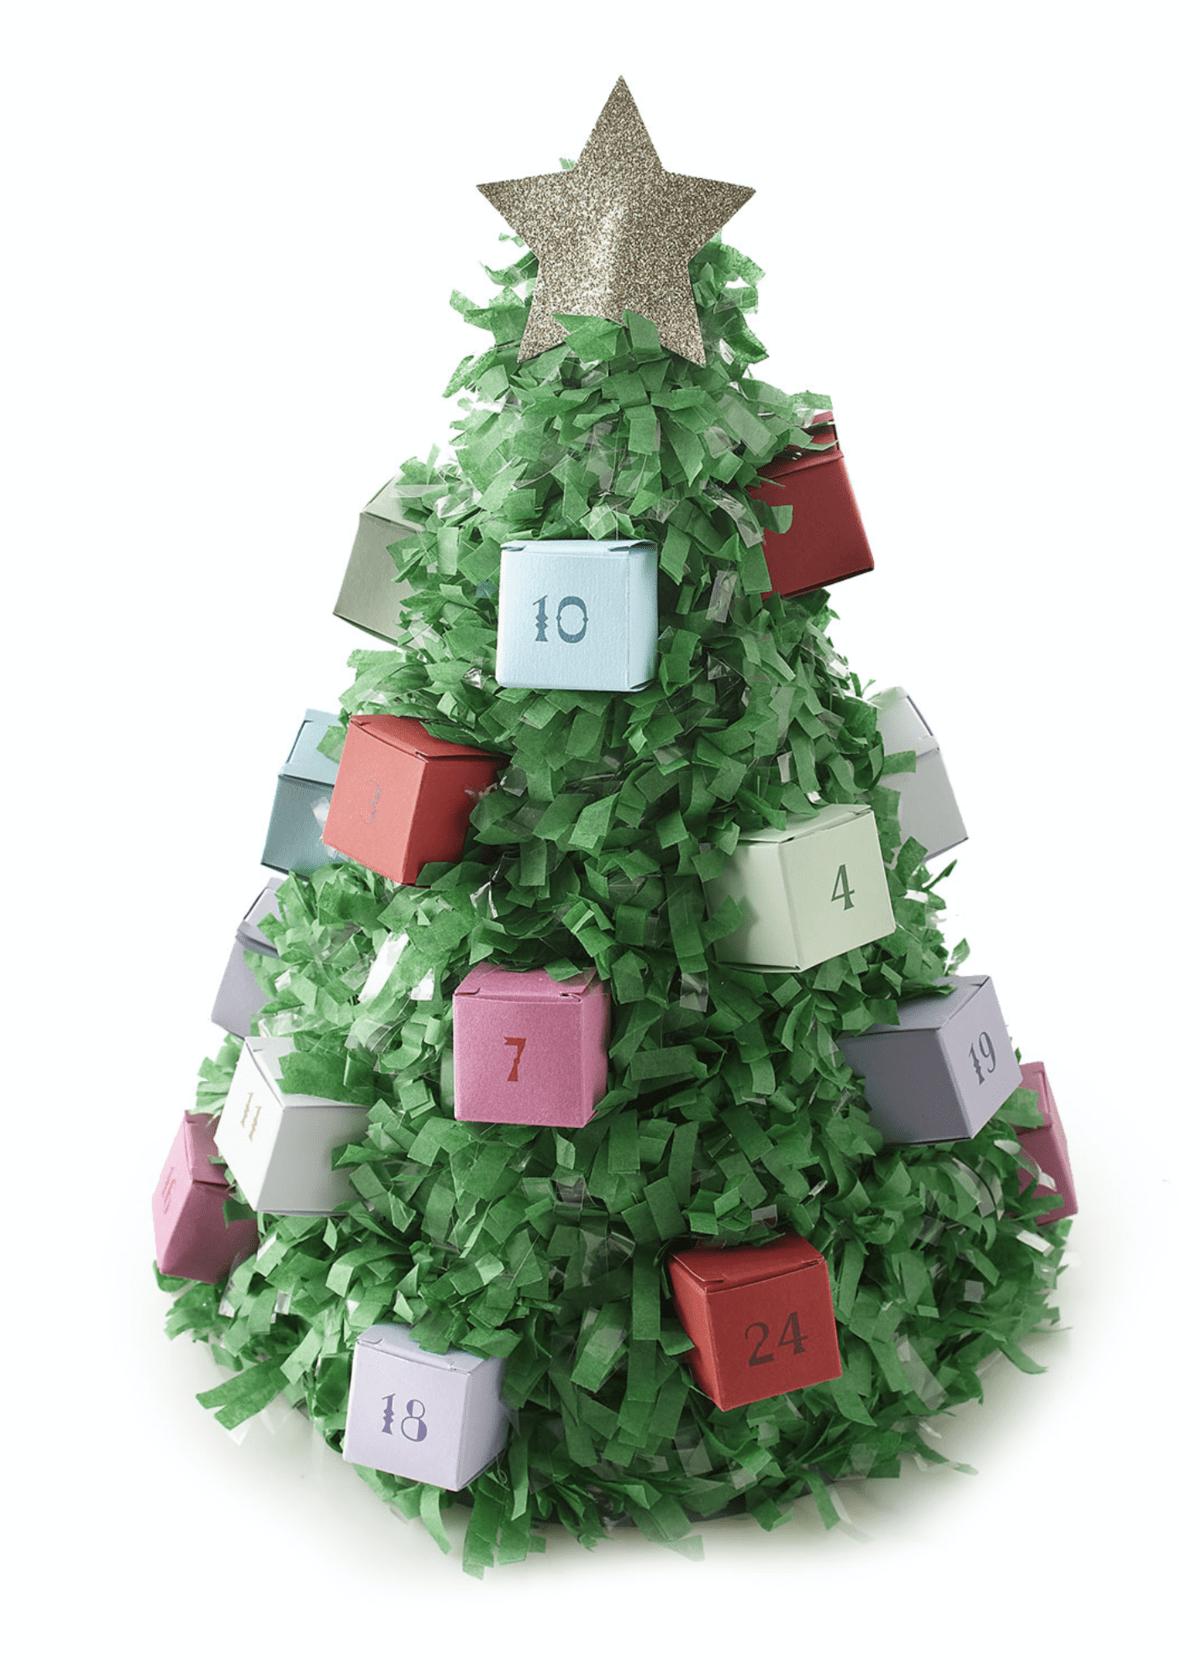 TOPS Malibu Inc. Merry Artisan Advent Tree – On Sale Now